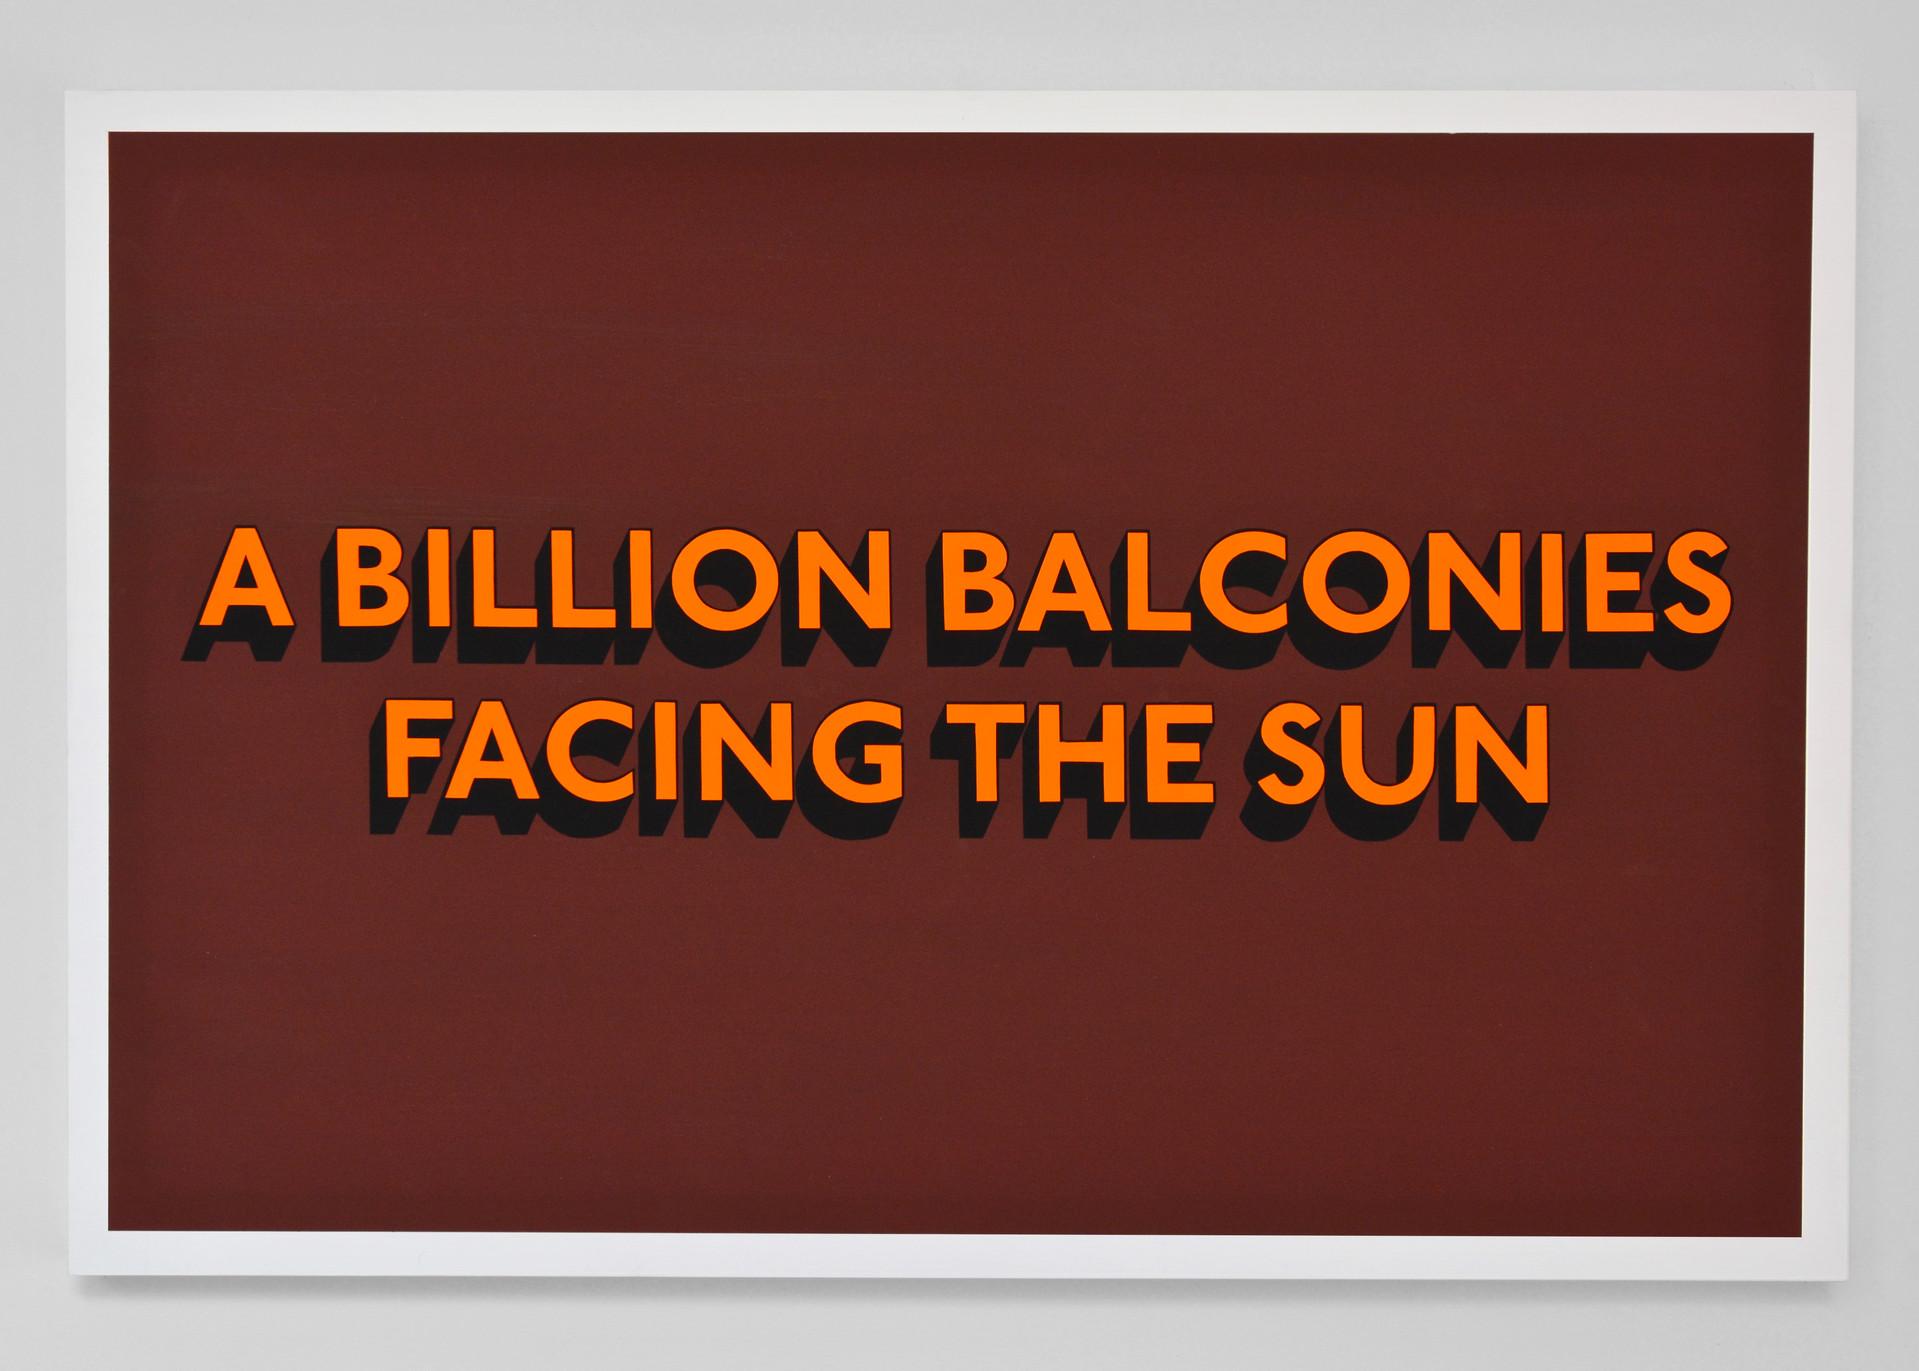 BILLION_BALCONIES.jpg